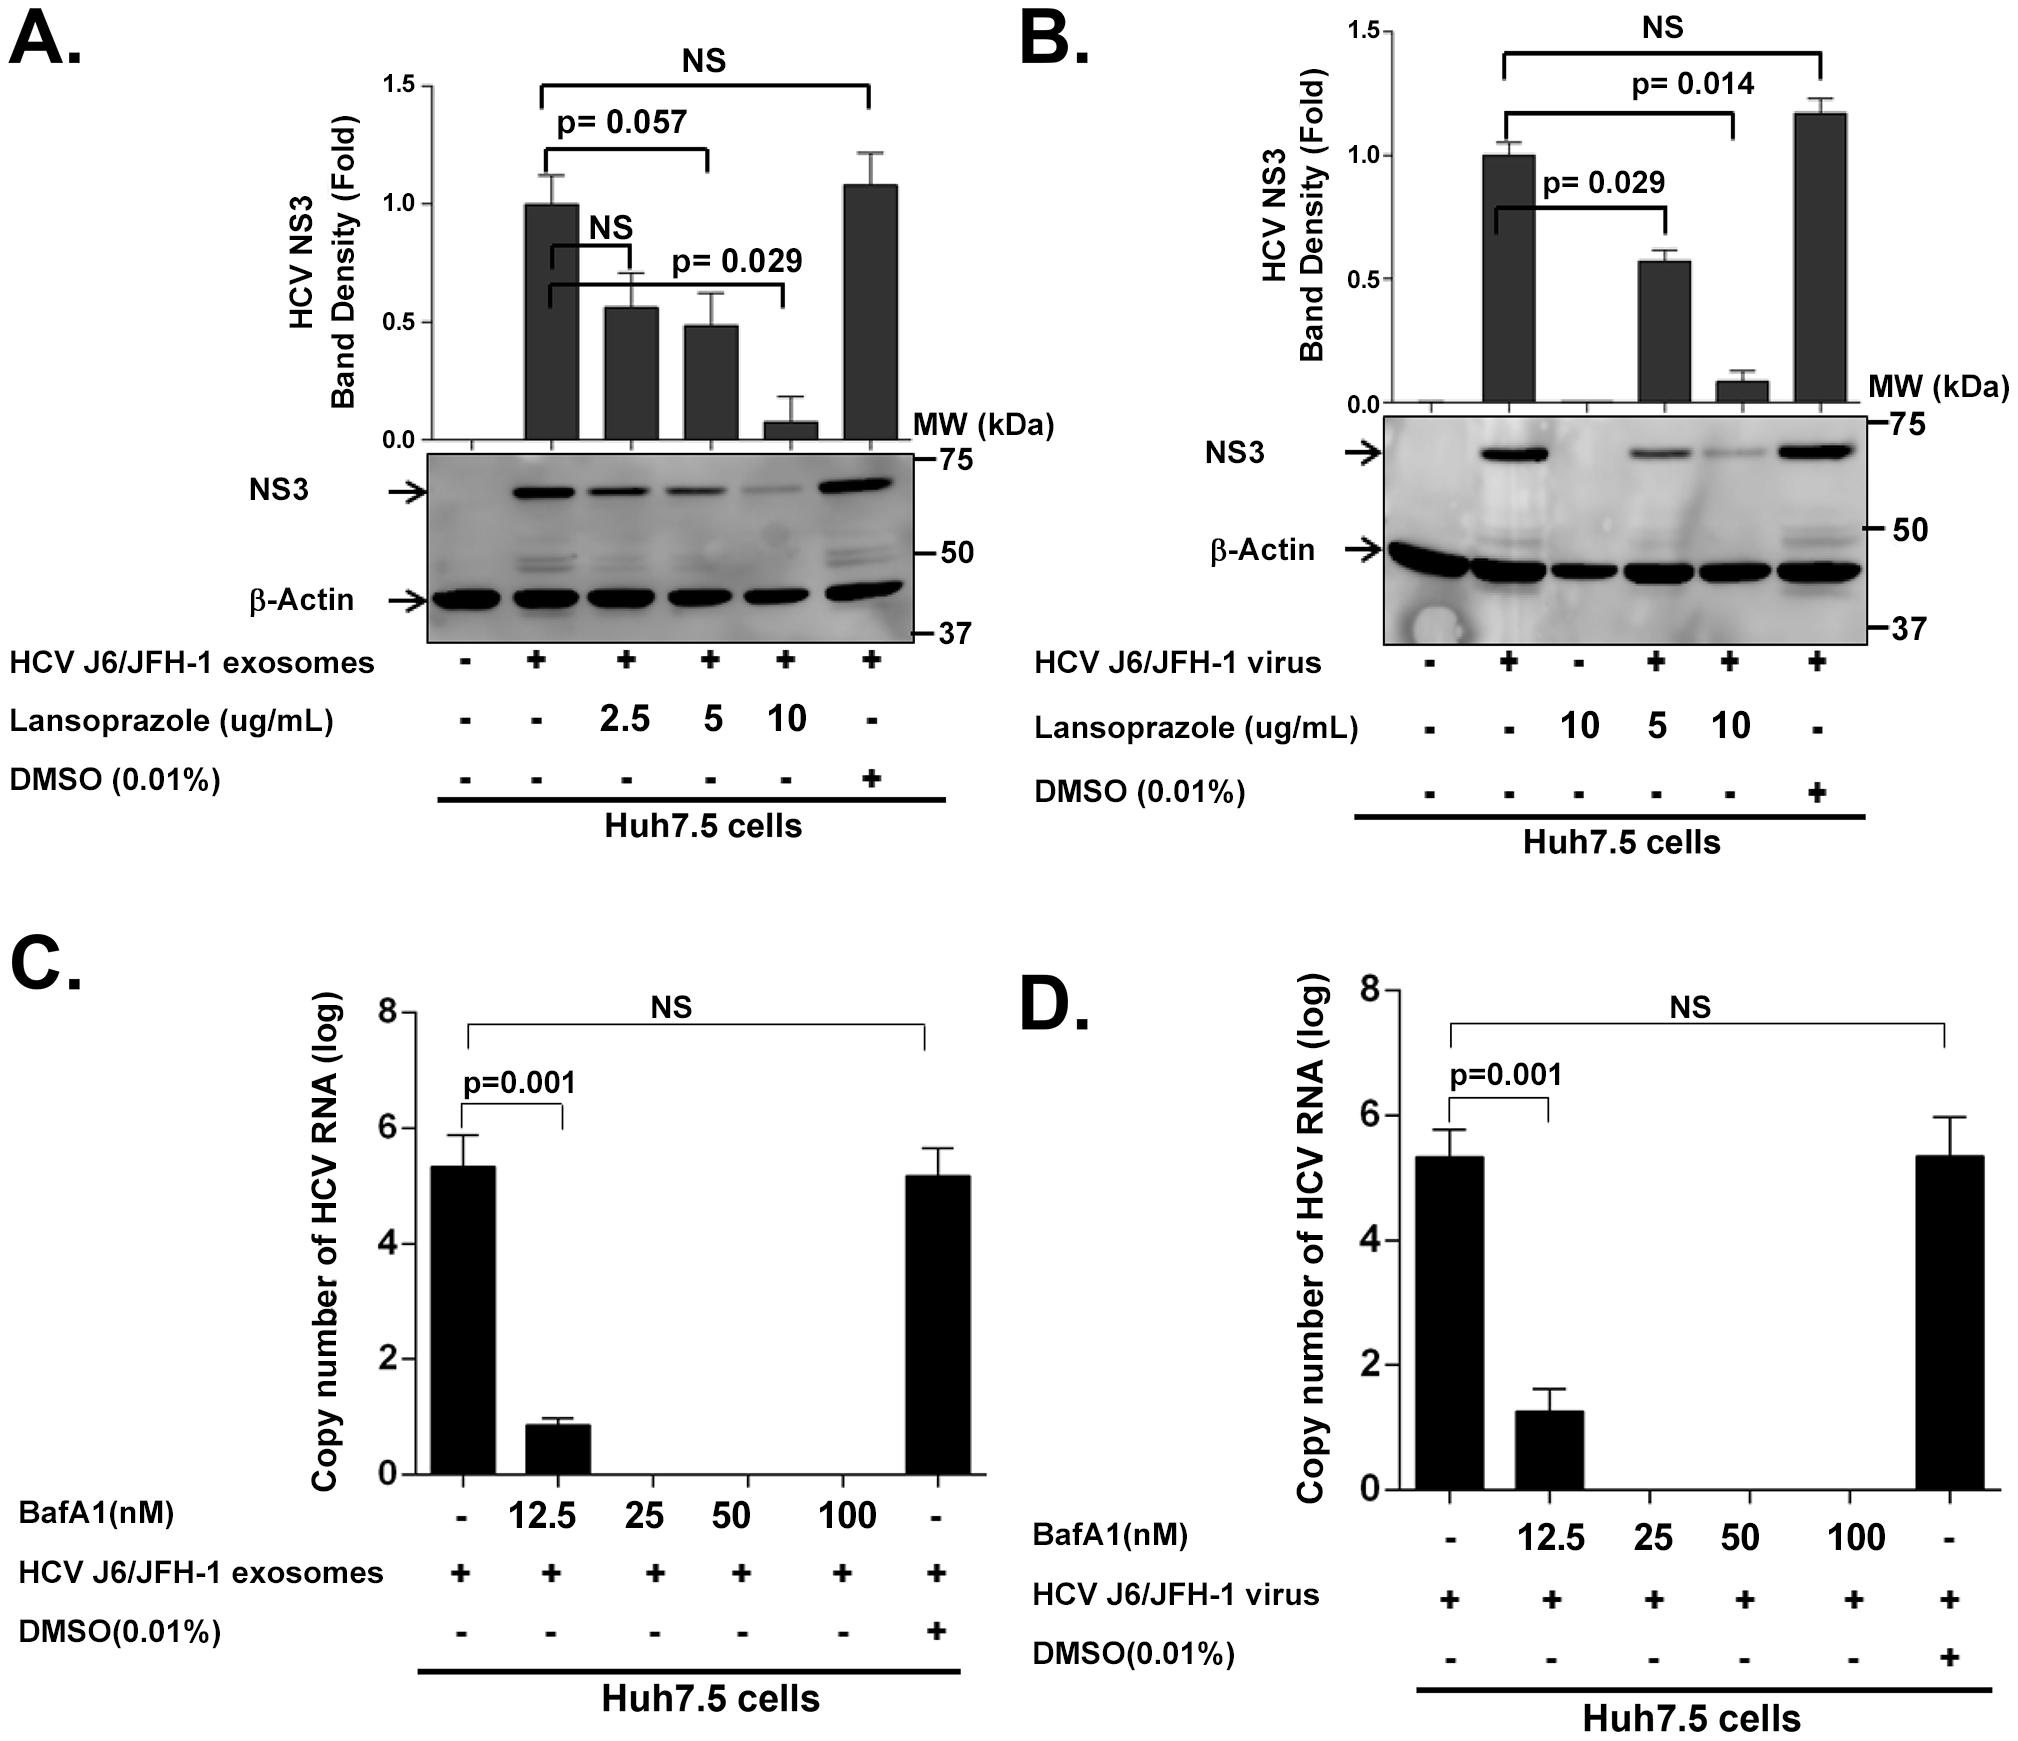 HCV transmission by exosomes and free virus can be blocked by proton pump inhibitor (Lansoprazole) and Vacuolar-type H+-ATPase inhibitor (bafilomycin A1).